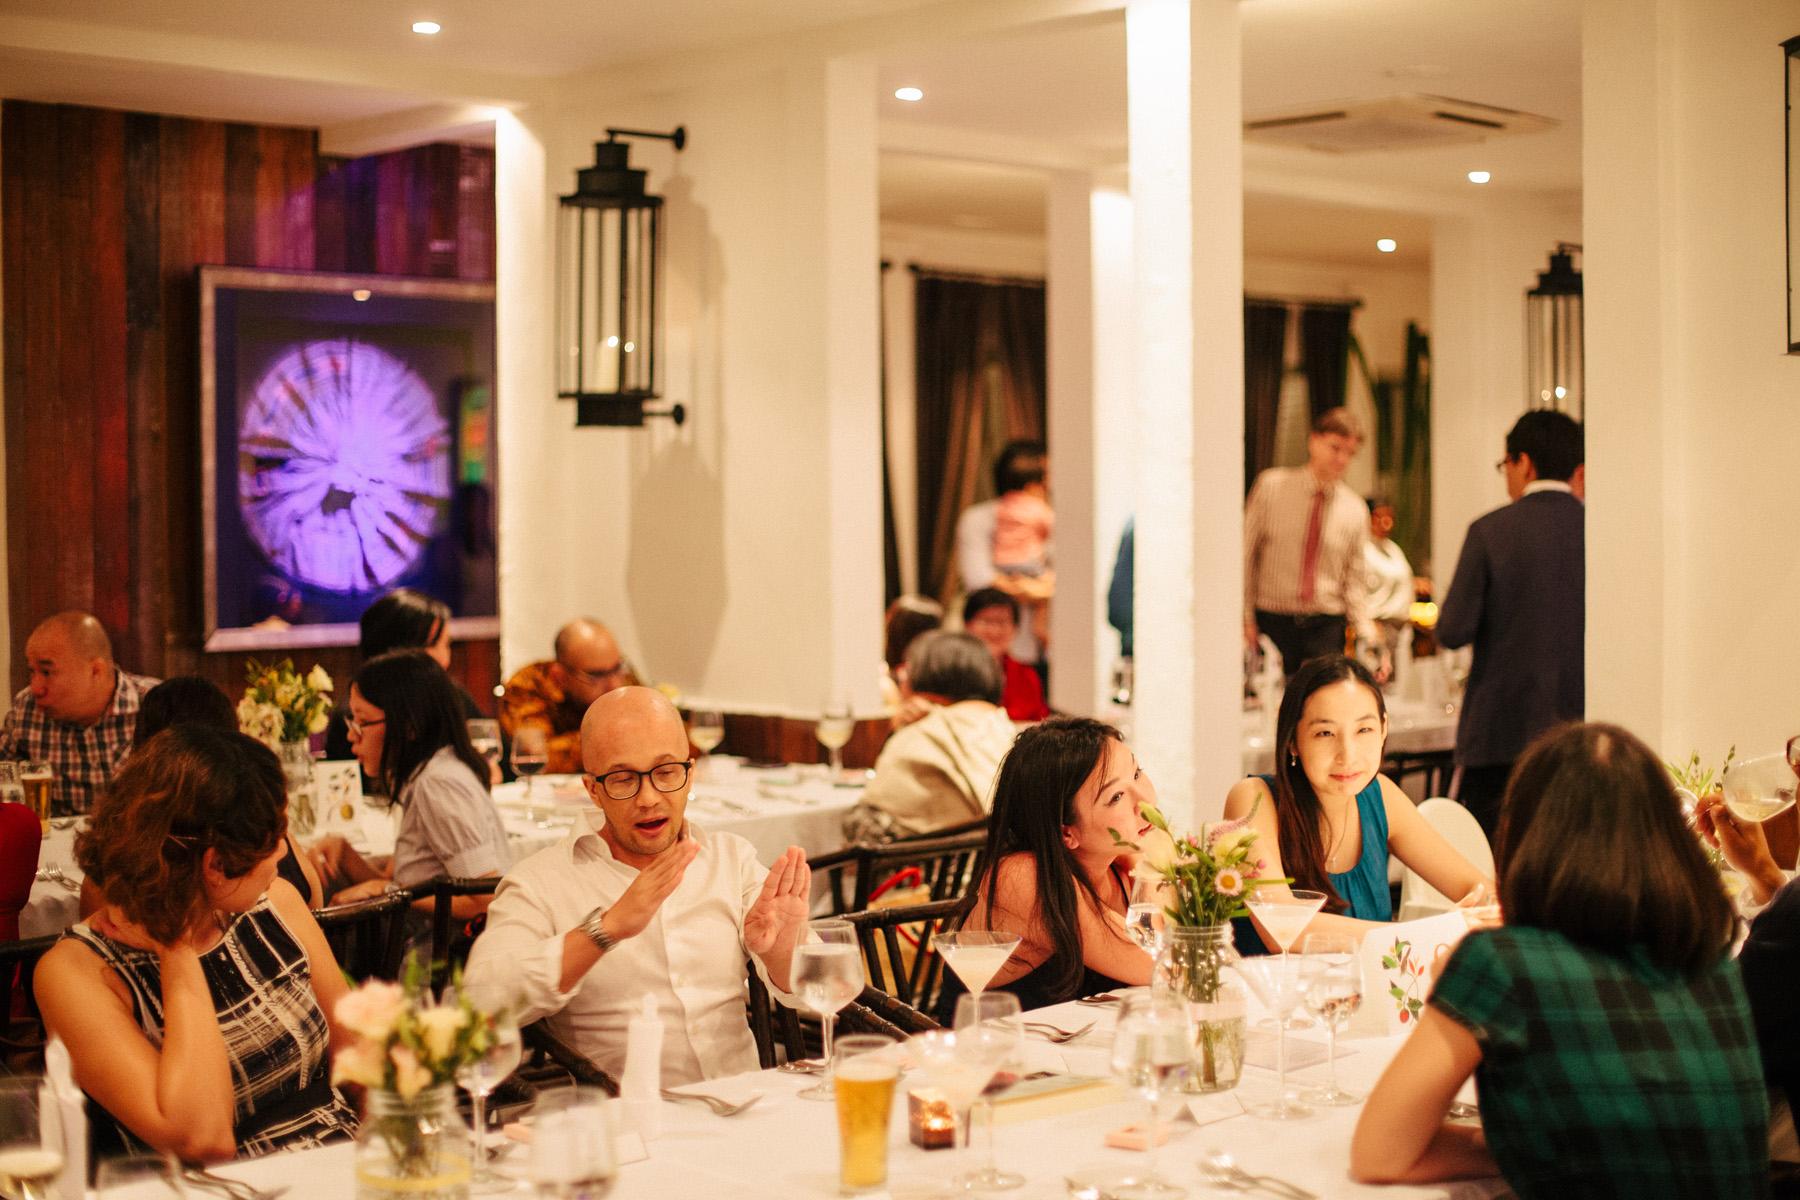 singapore-wedding-travel-photographer-faith-alvin-wedding-wmt-49.jpg